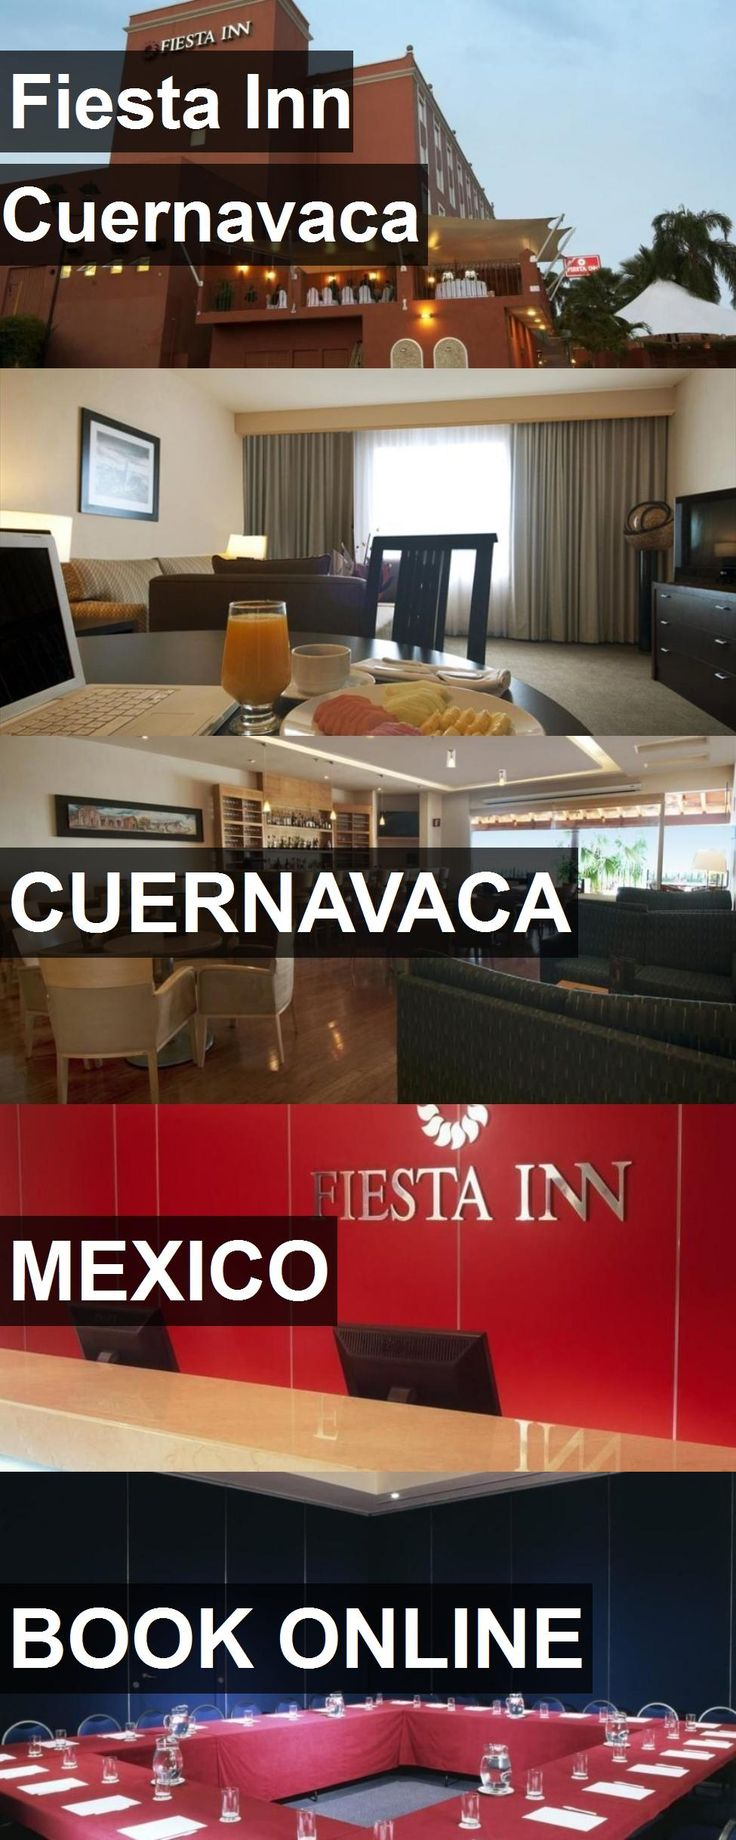 Hotel Fiesta Inn Cuernavaca in Cuernavaca, Mexico. For more information, photos, reviews and best prices please follow the link. #Mexico #Cuernavaca #travel #vacation #hotel